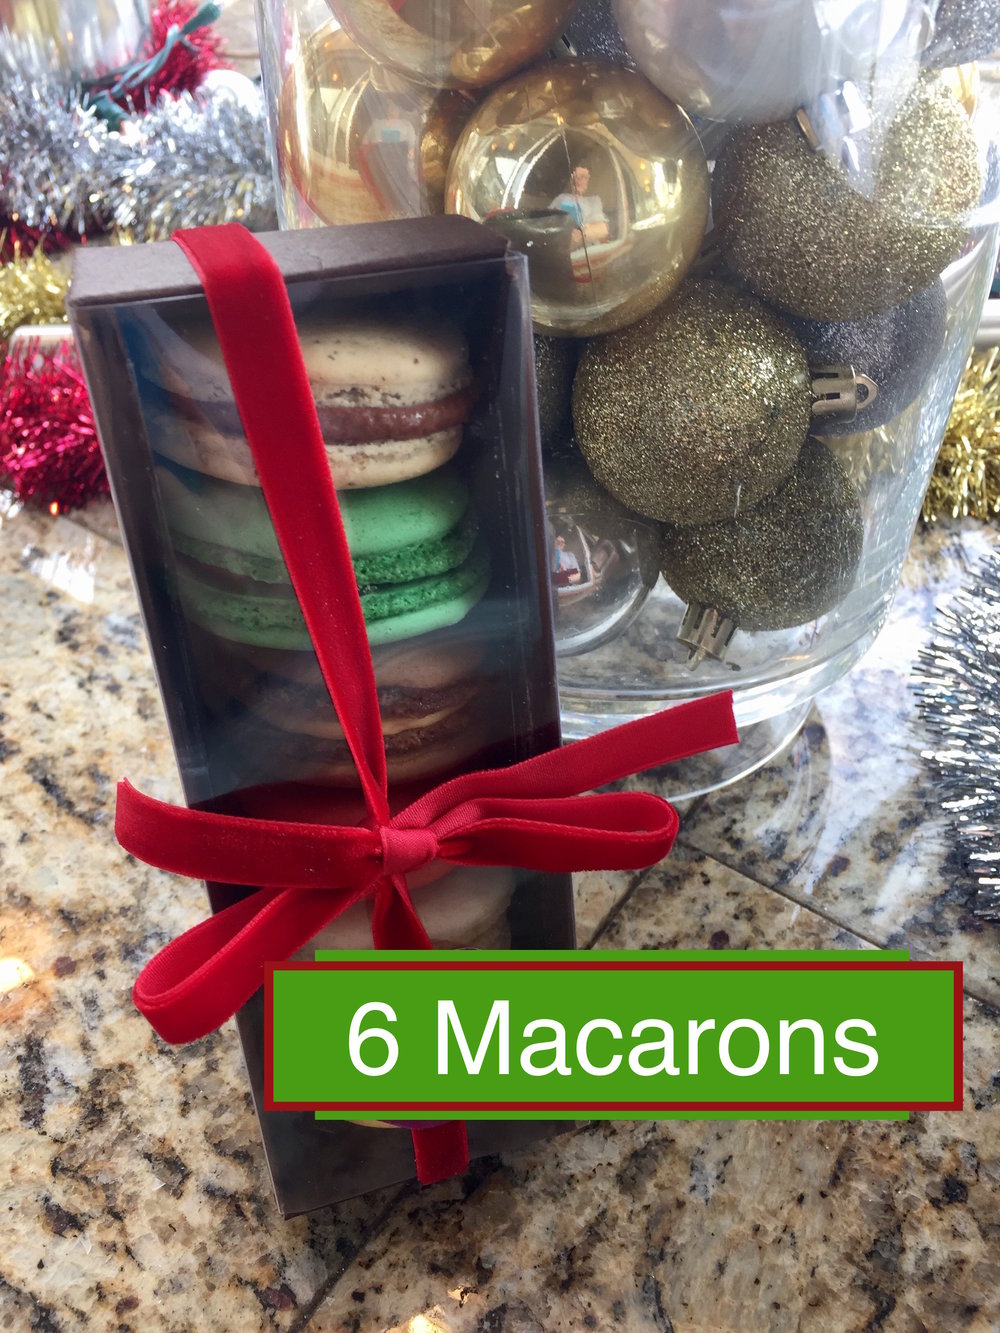 6 Macarons.jpg